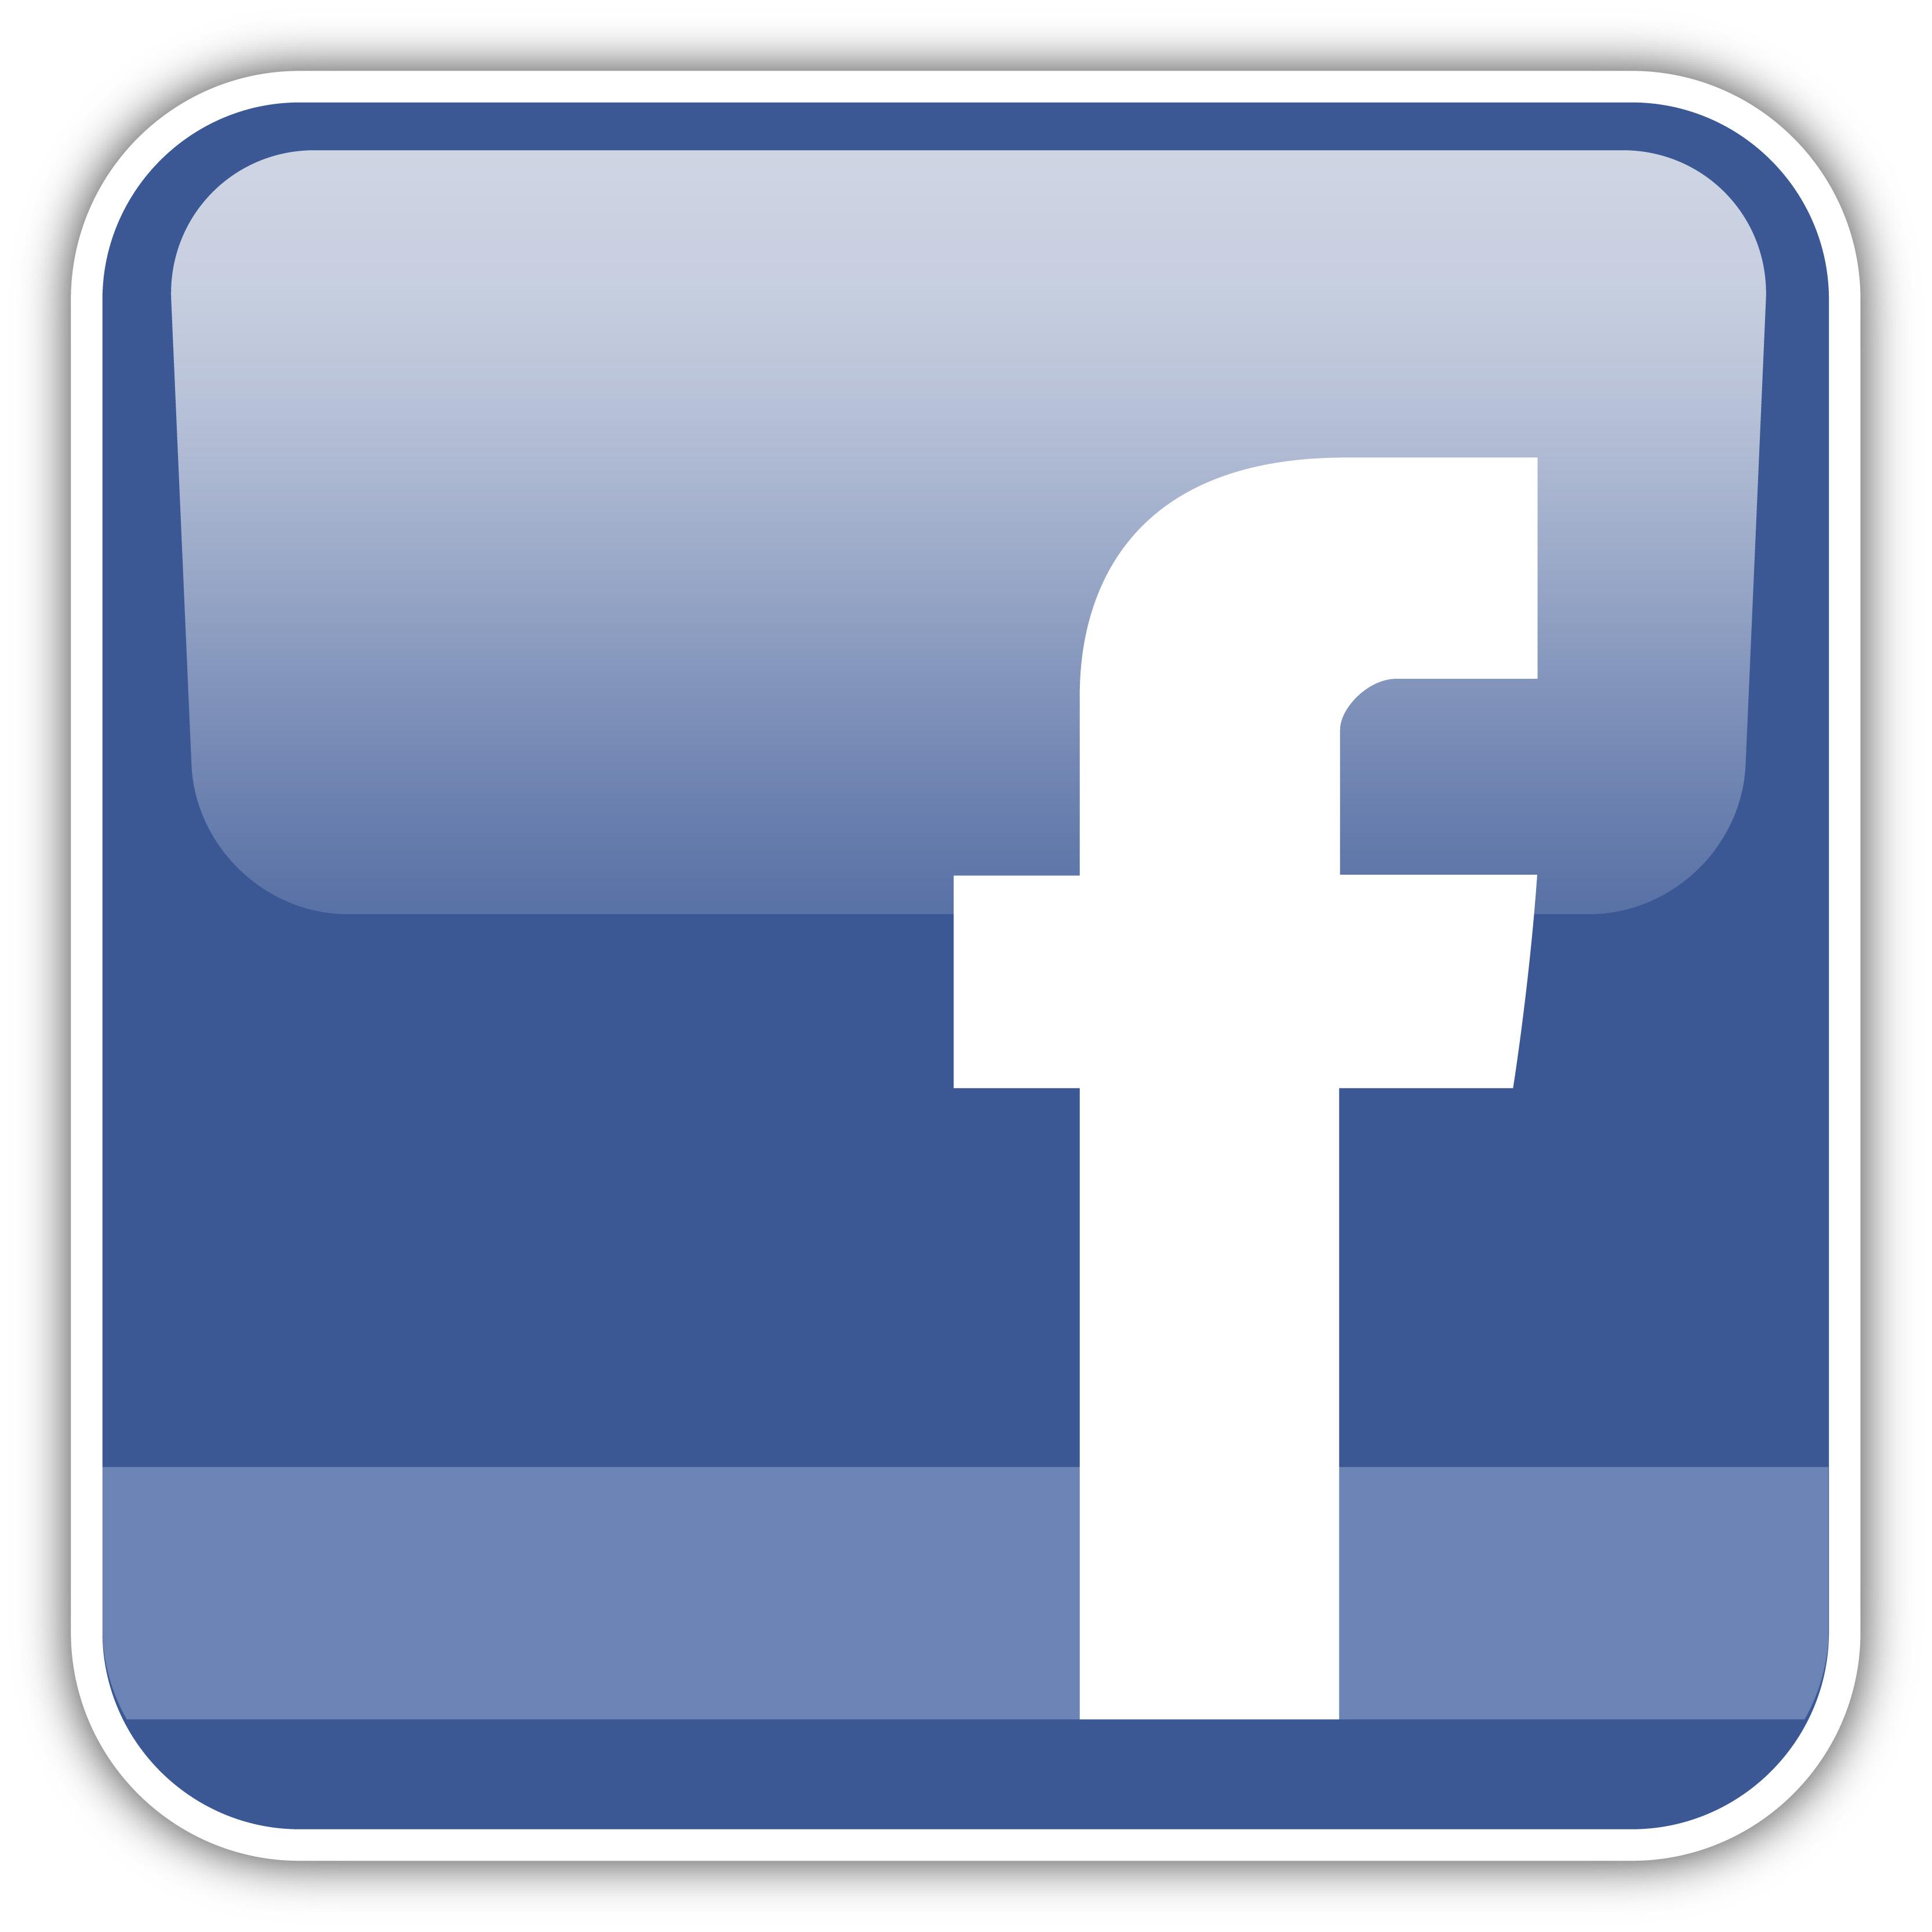 Výsledek obrázku pro facebook icon png